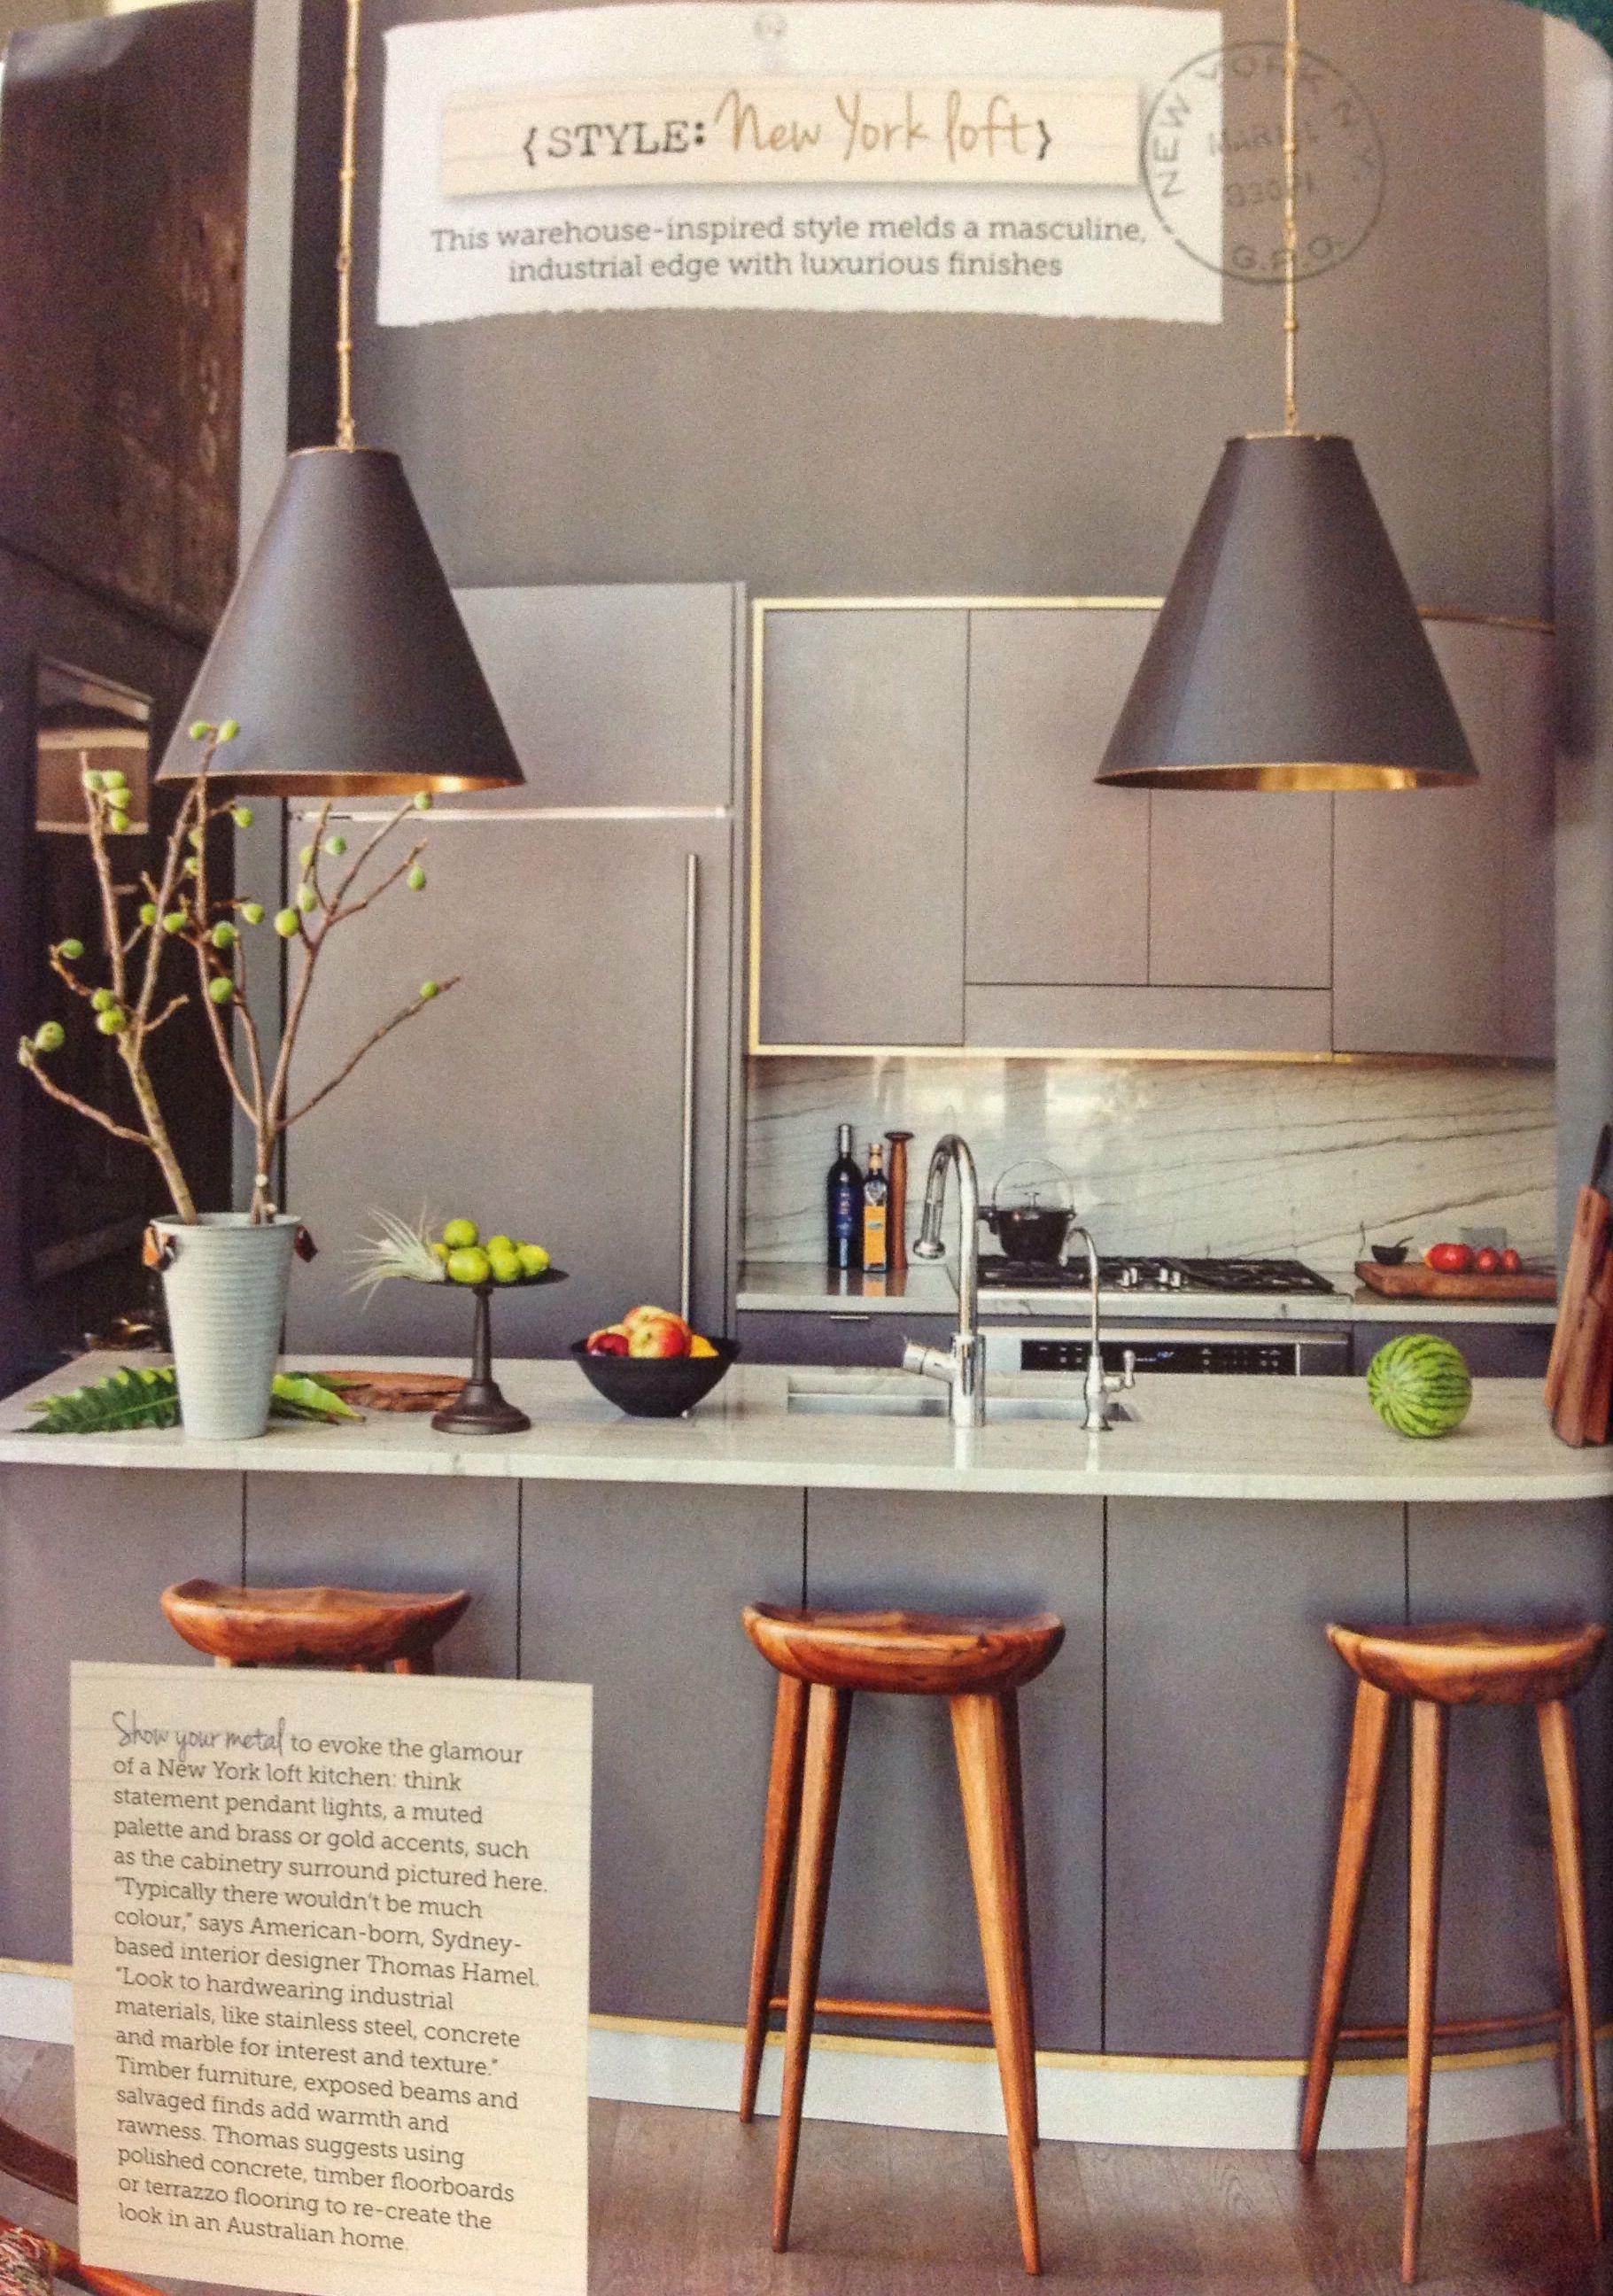 New York Loft Style Kitchen Kitchen Design Small House Interior Kitchen Design